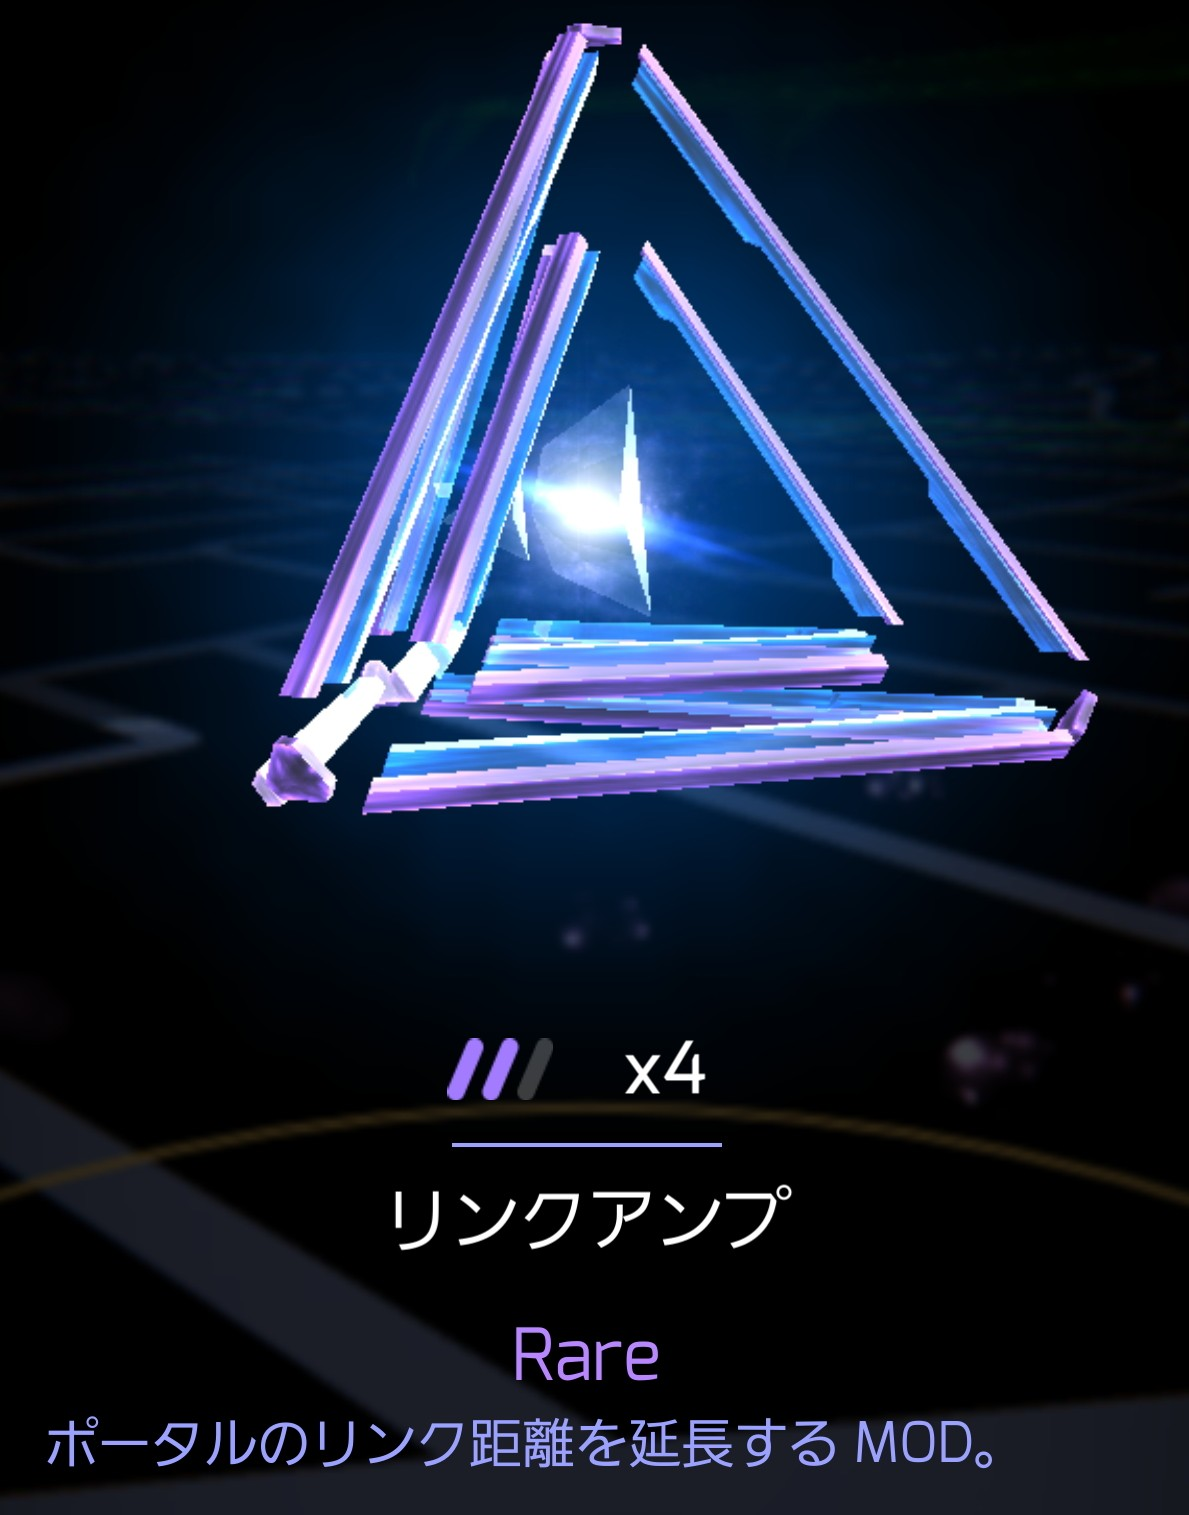 【MMMMORPG】Ingress攻略(Wiki風味)【大規模社會実験】: リンクアンプ ...